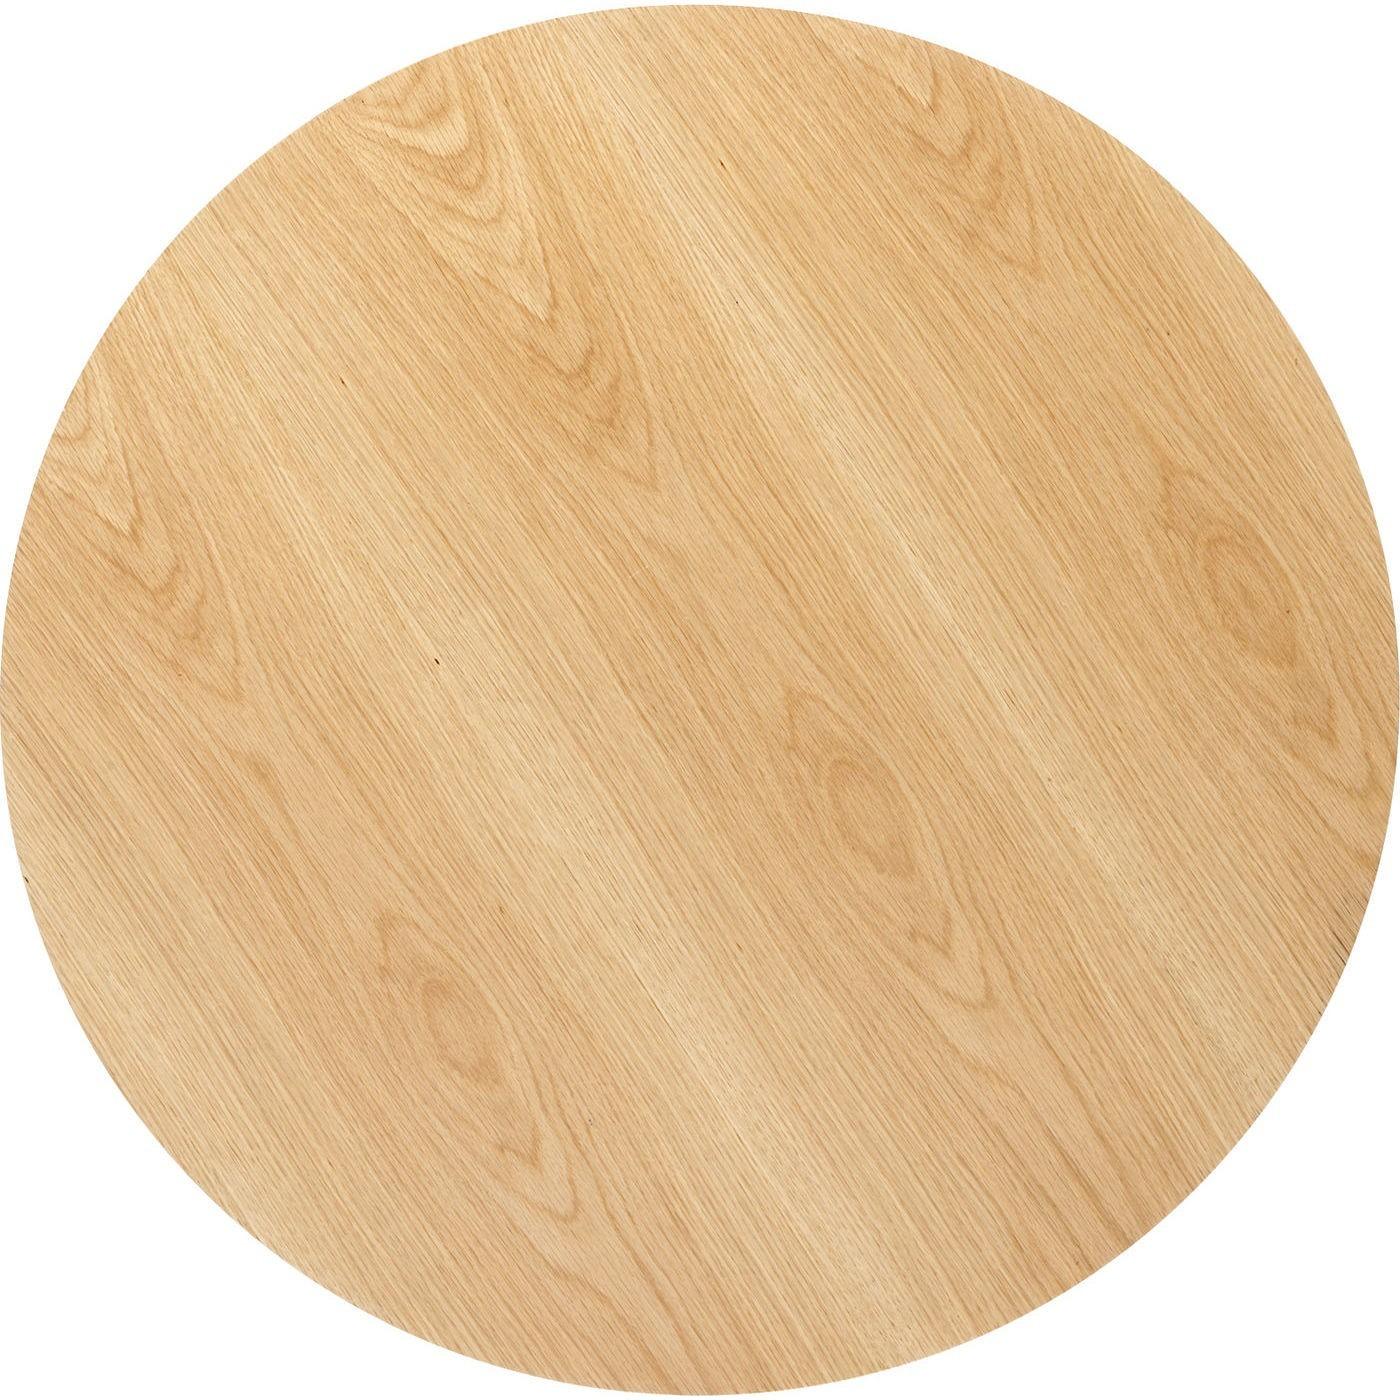 Table Invitation 120cm chêne & noire Kare Design